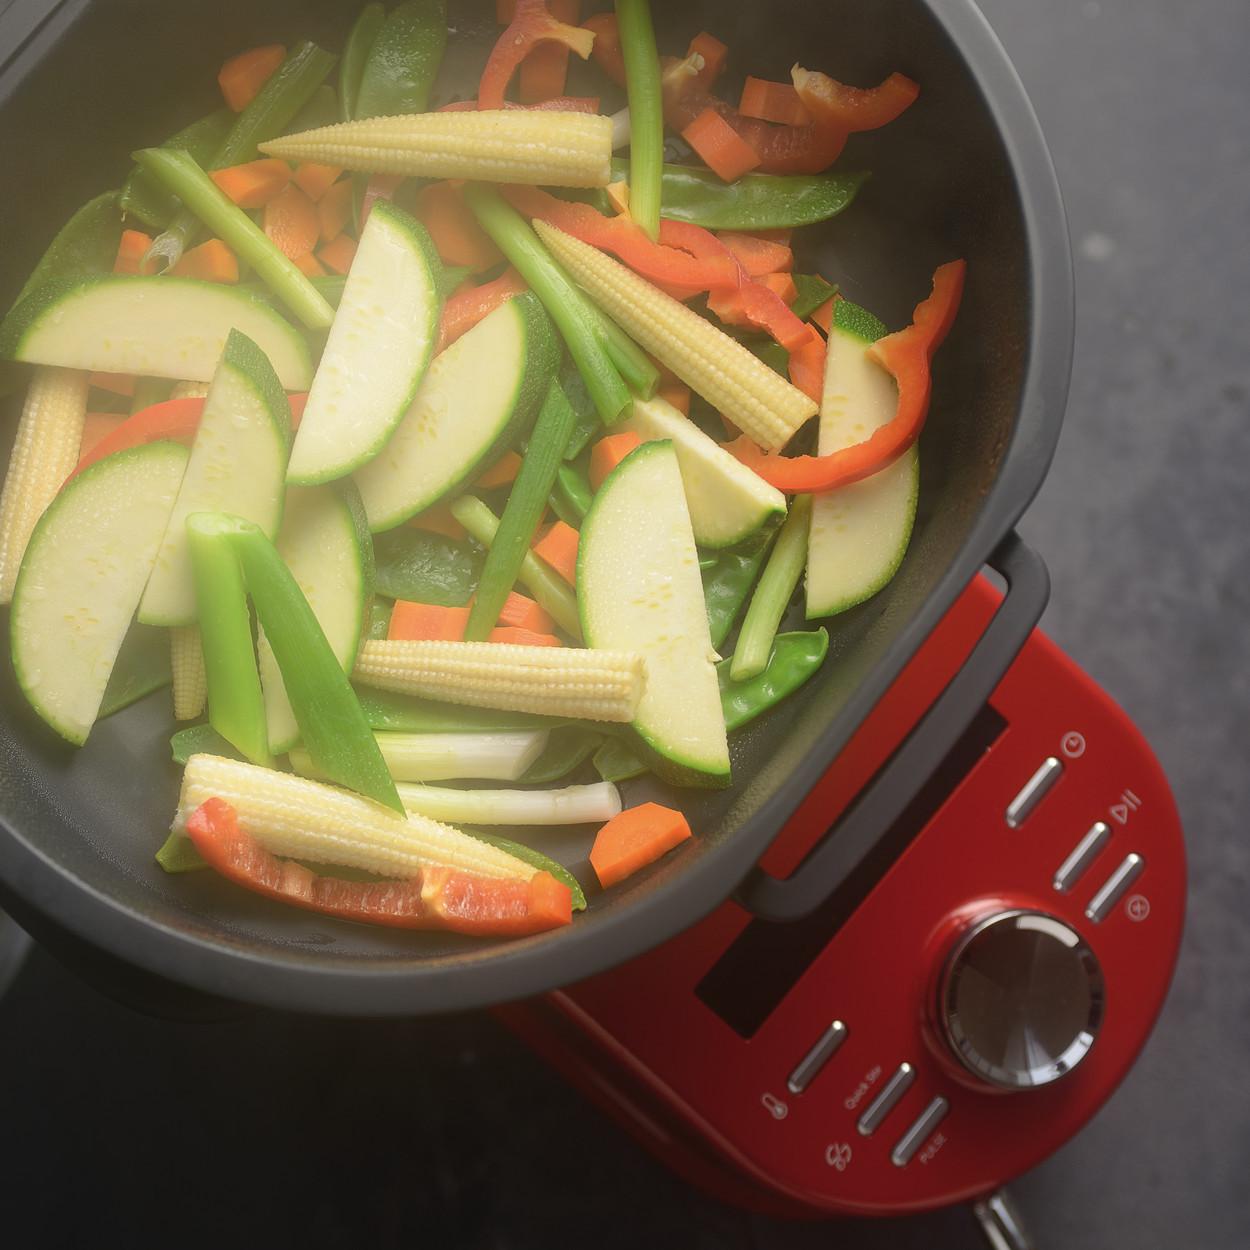 KitchenAid Artisan Cook Processor 5KCF0104EMS/4 - Dünsten